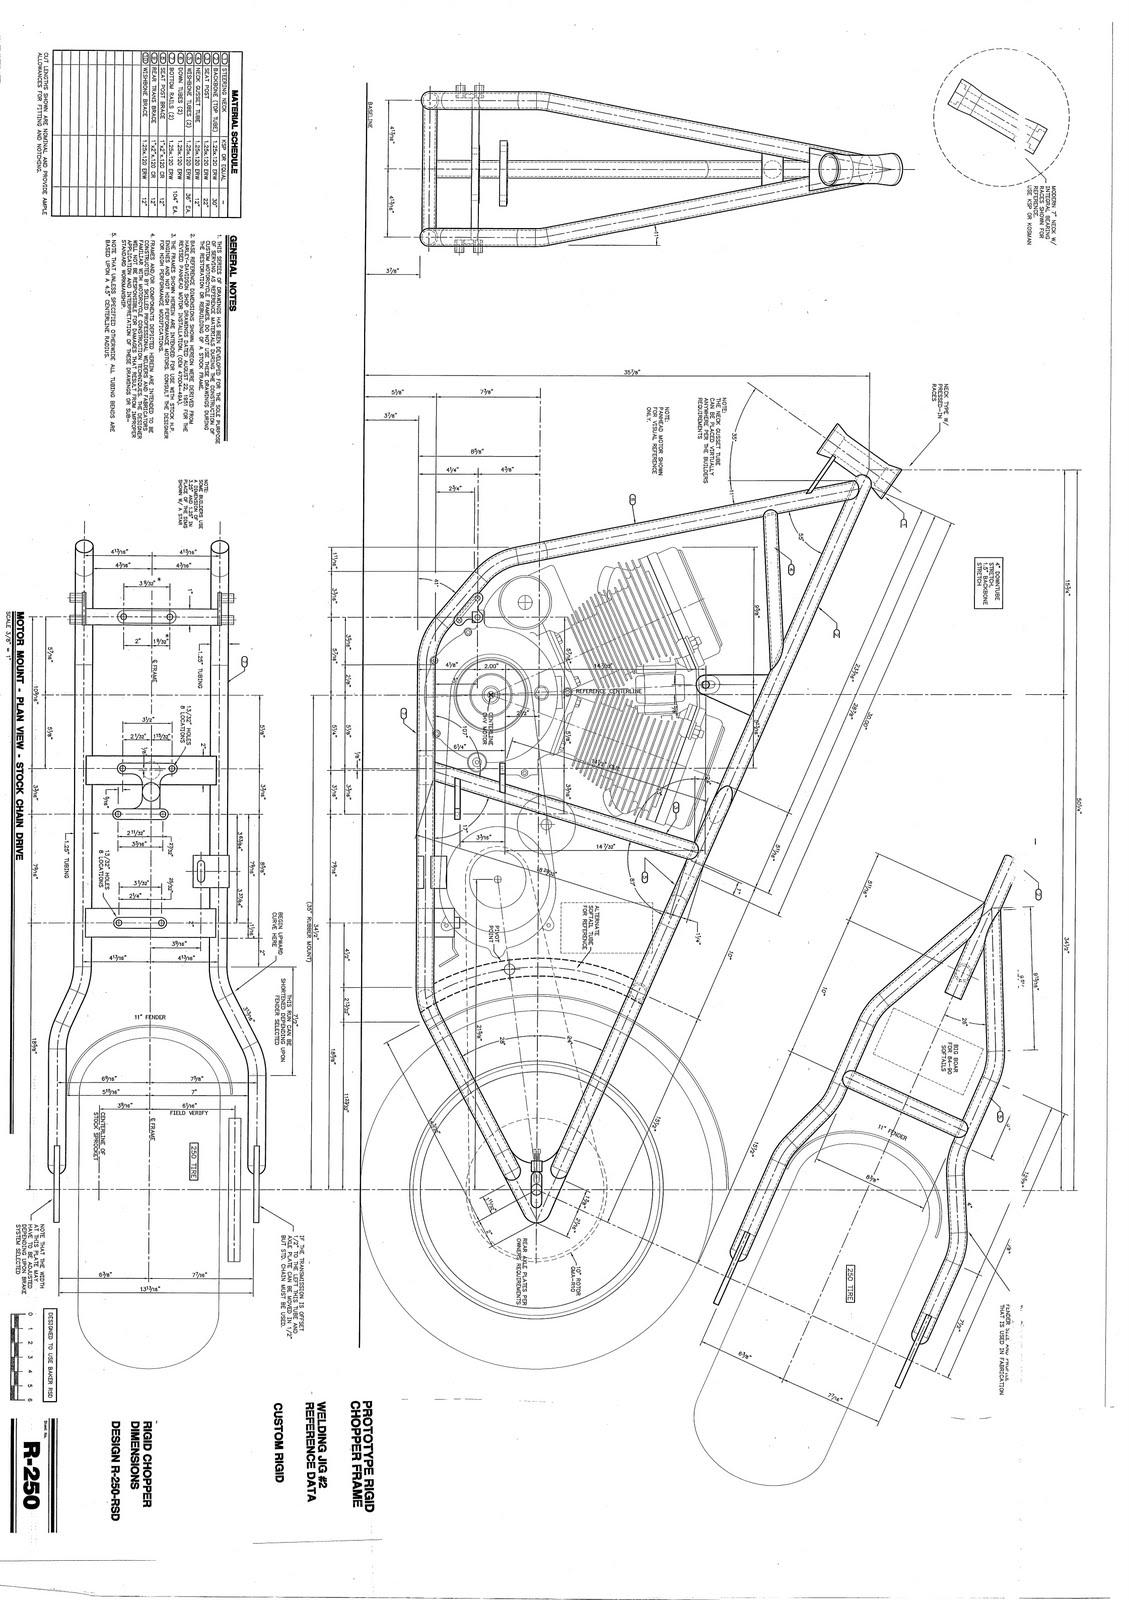 razor electric scooter wiring diagram in addition mini chopper